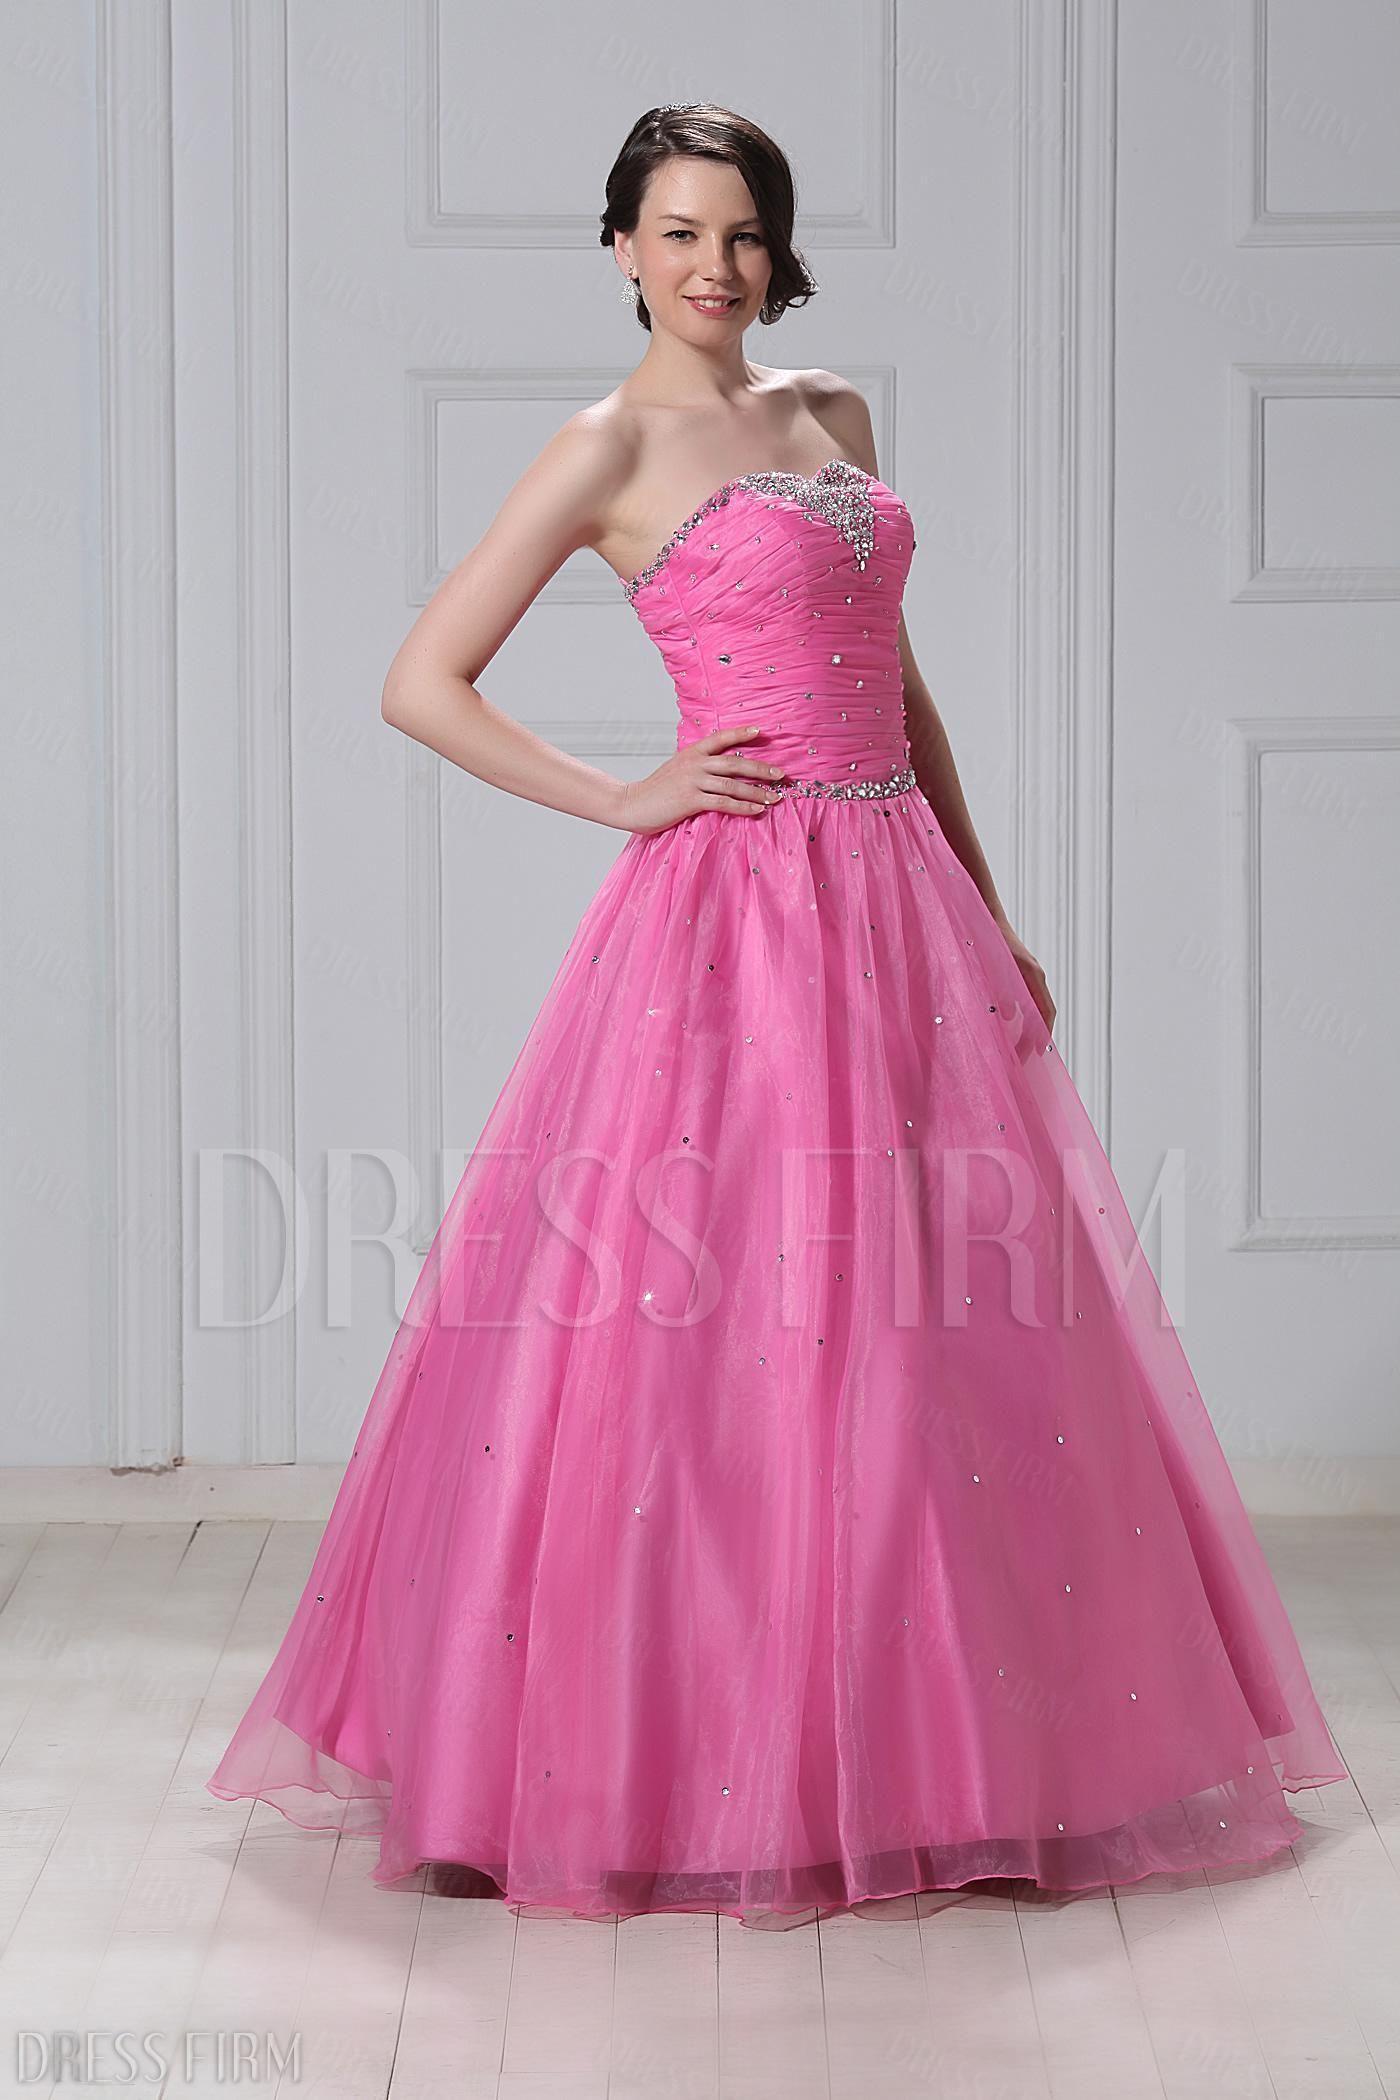 Fascinating sweetheart floorlength lubaus ball gownprom dress